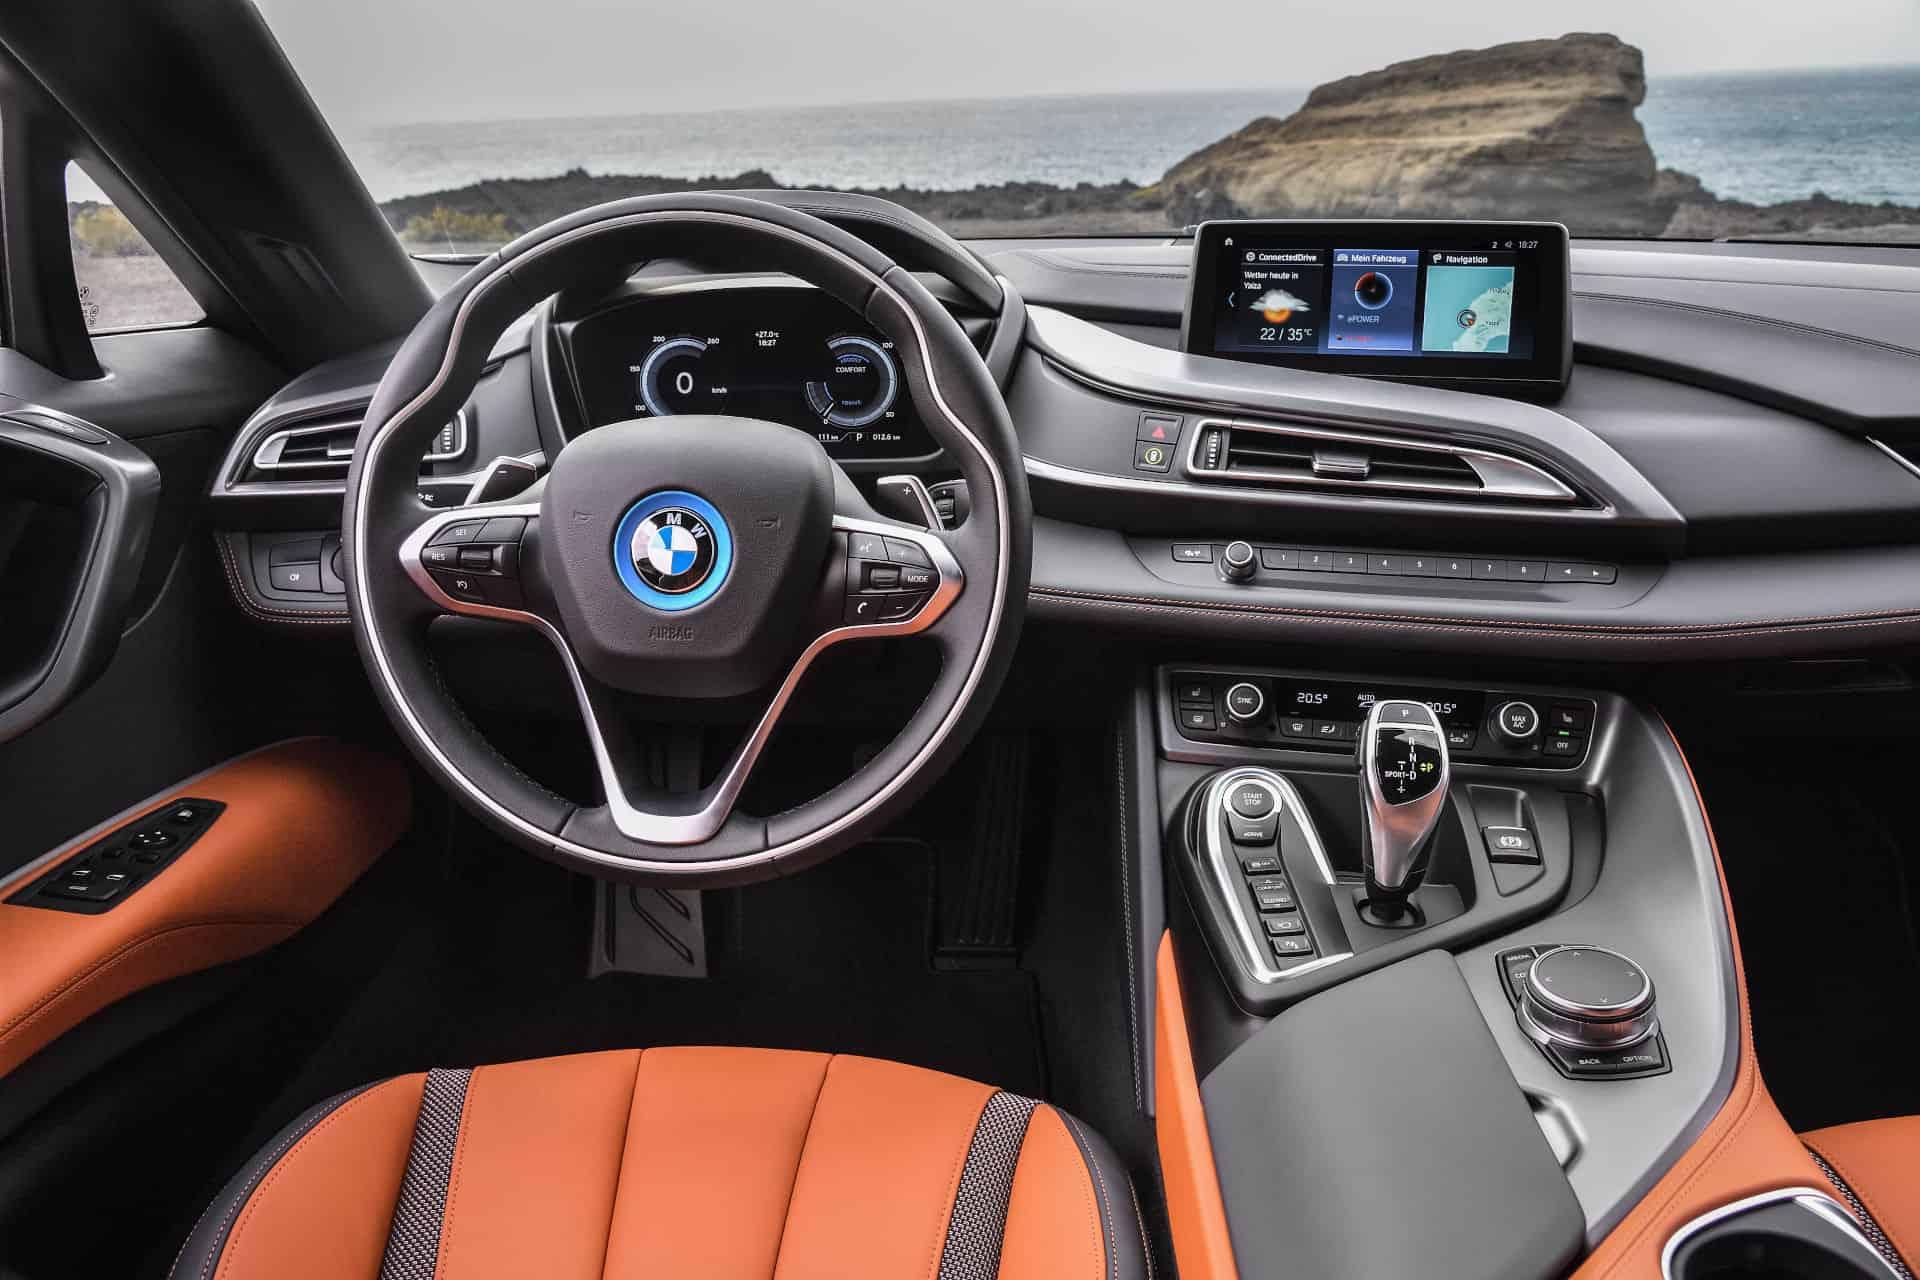 BMWi8 Roadster dashboard